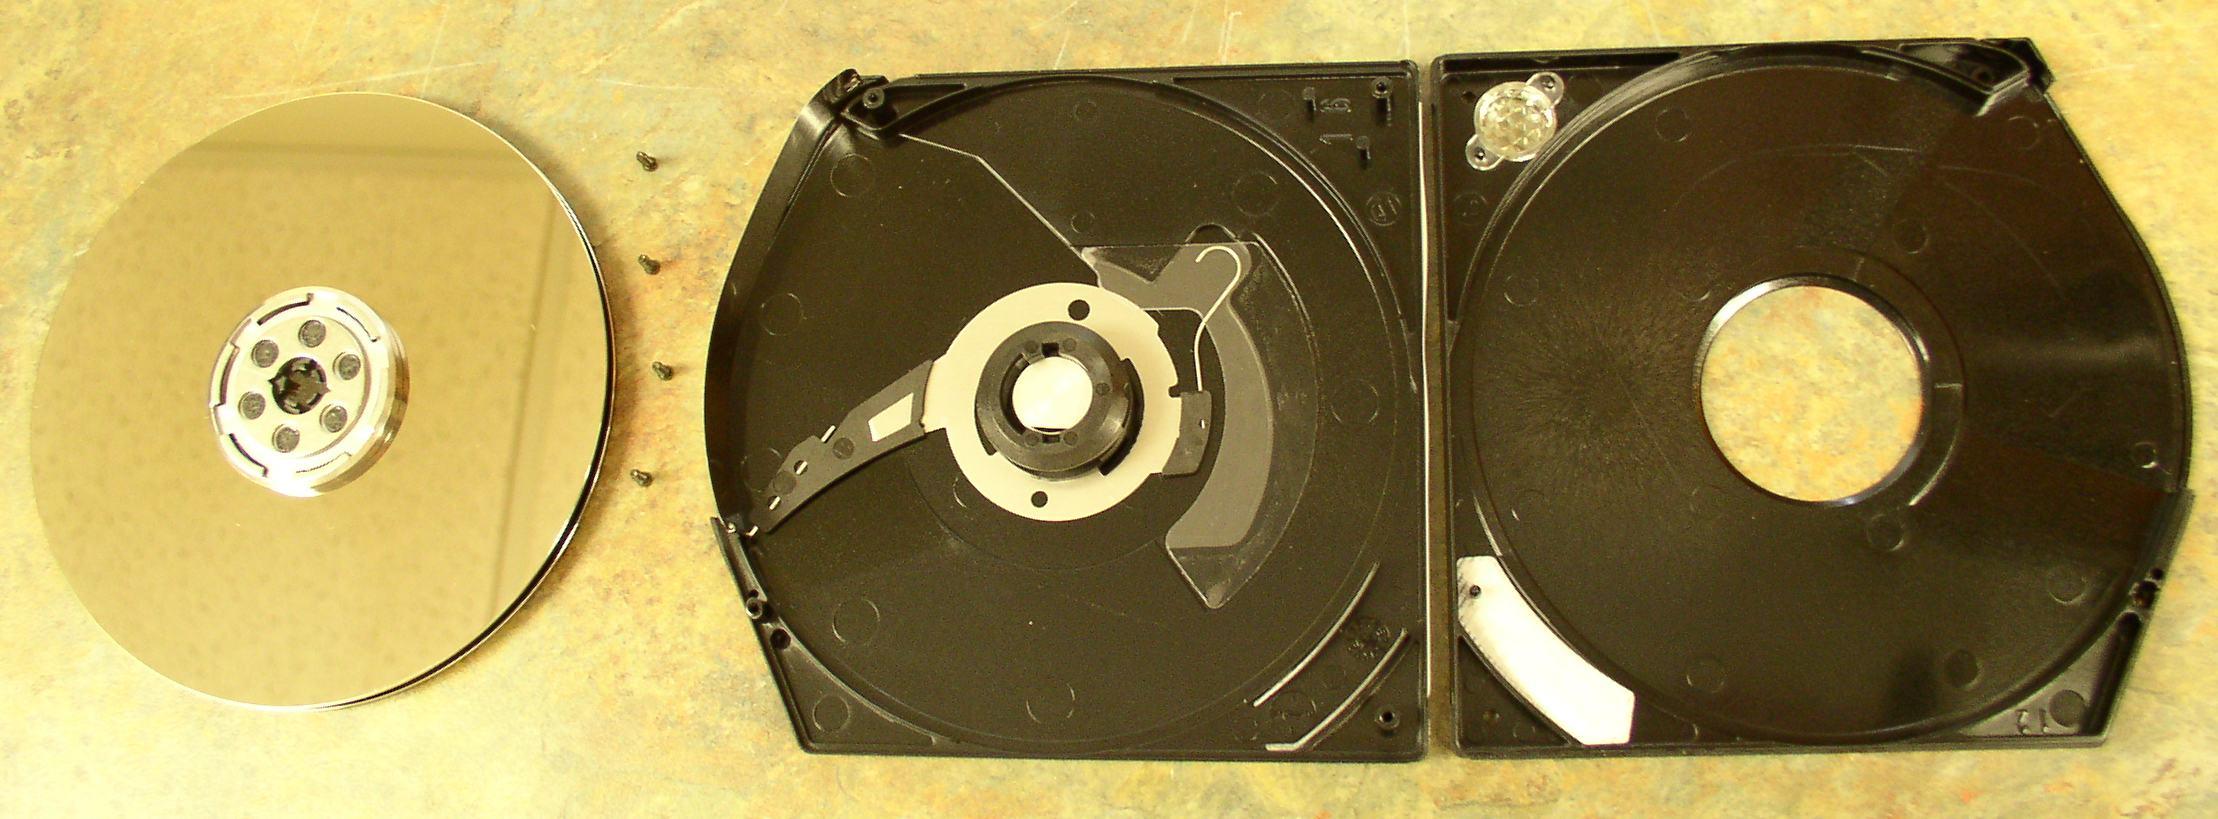 File:Iomega jaz 1GB inside JPG - Wikimedia Commons